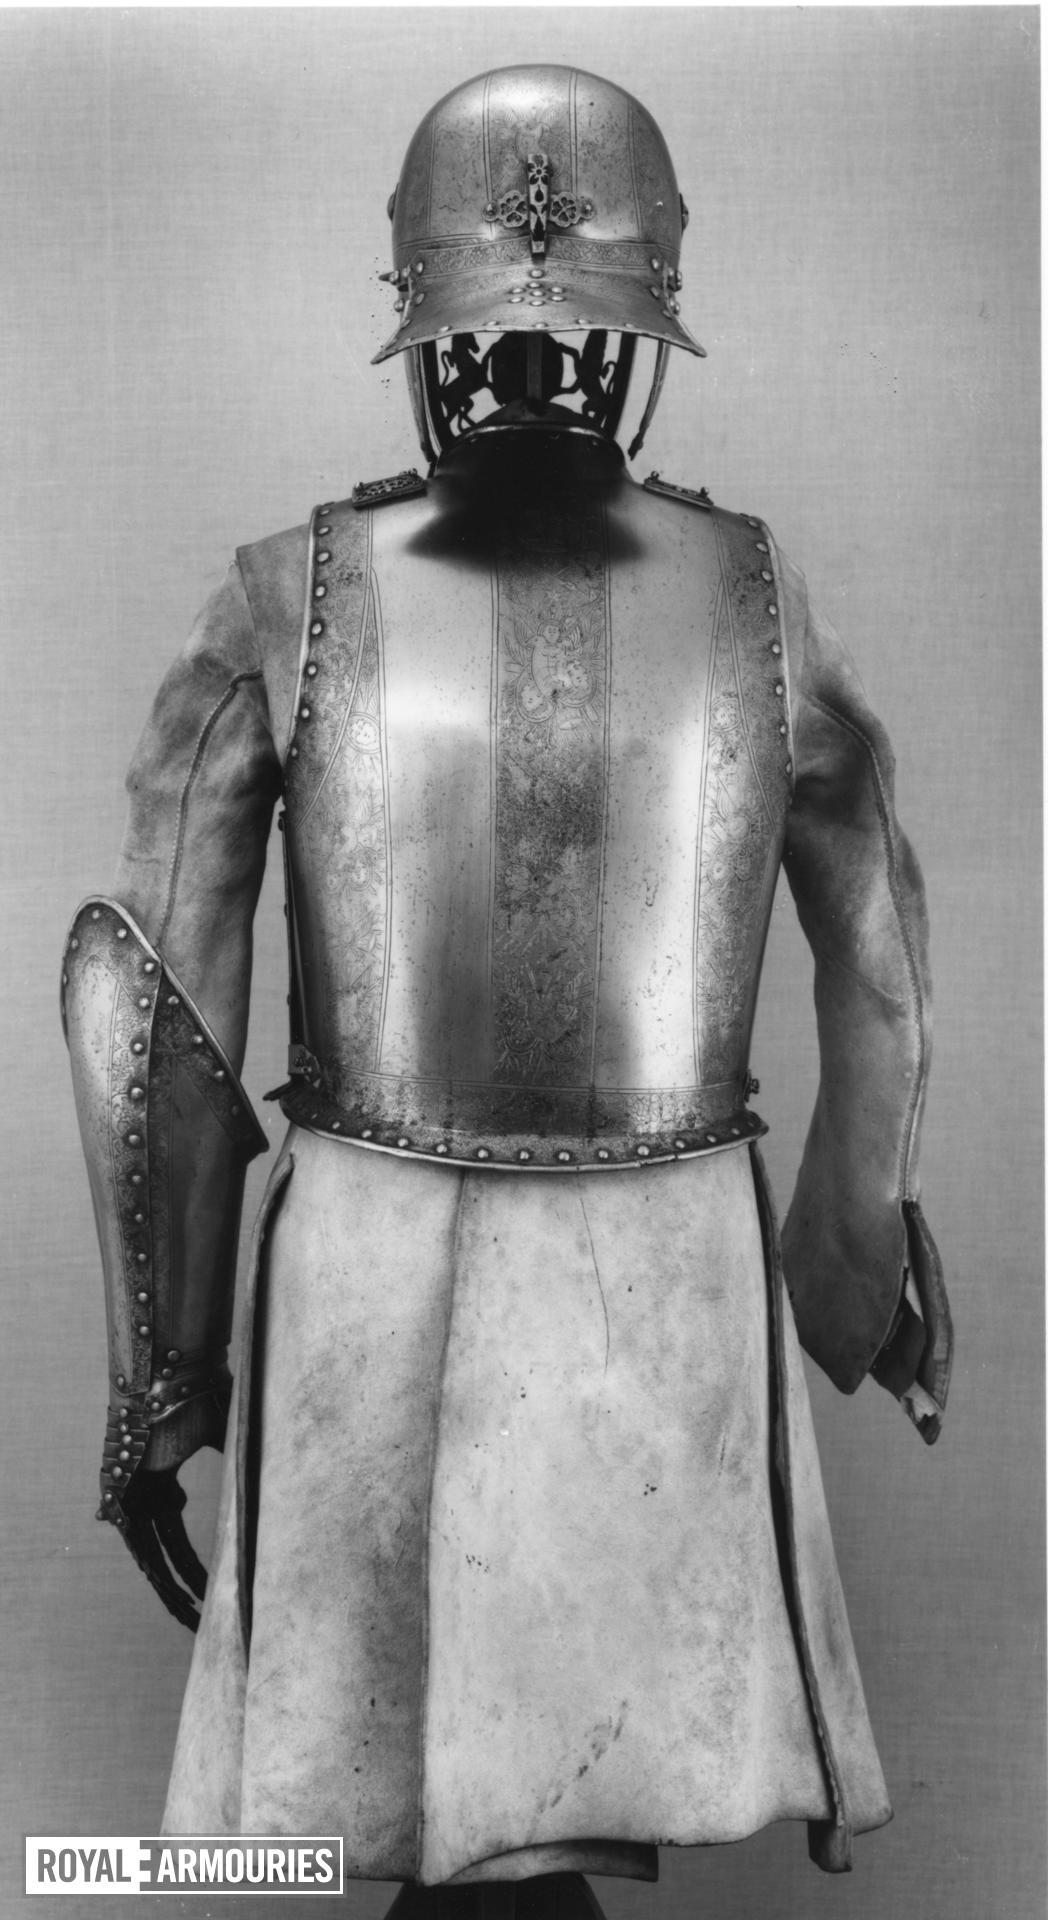 Armour - Armour of King James II of King James II (1633-1701) by Richard Hoden